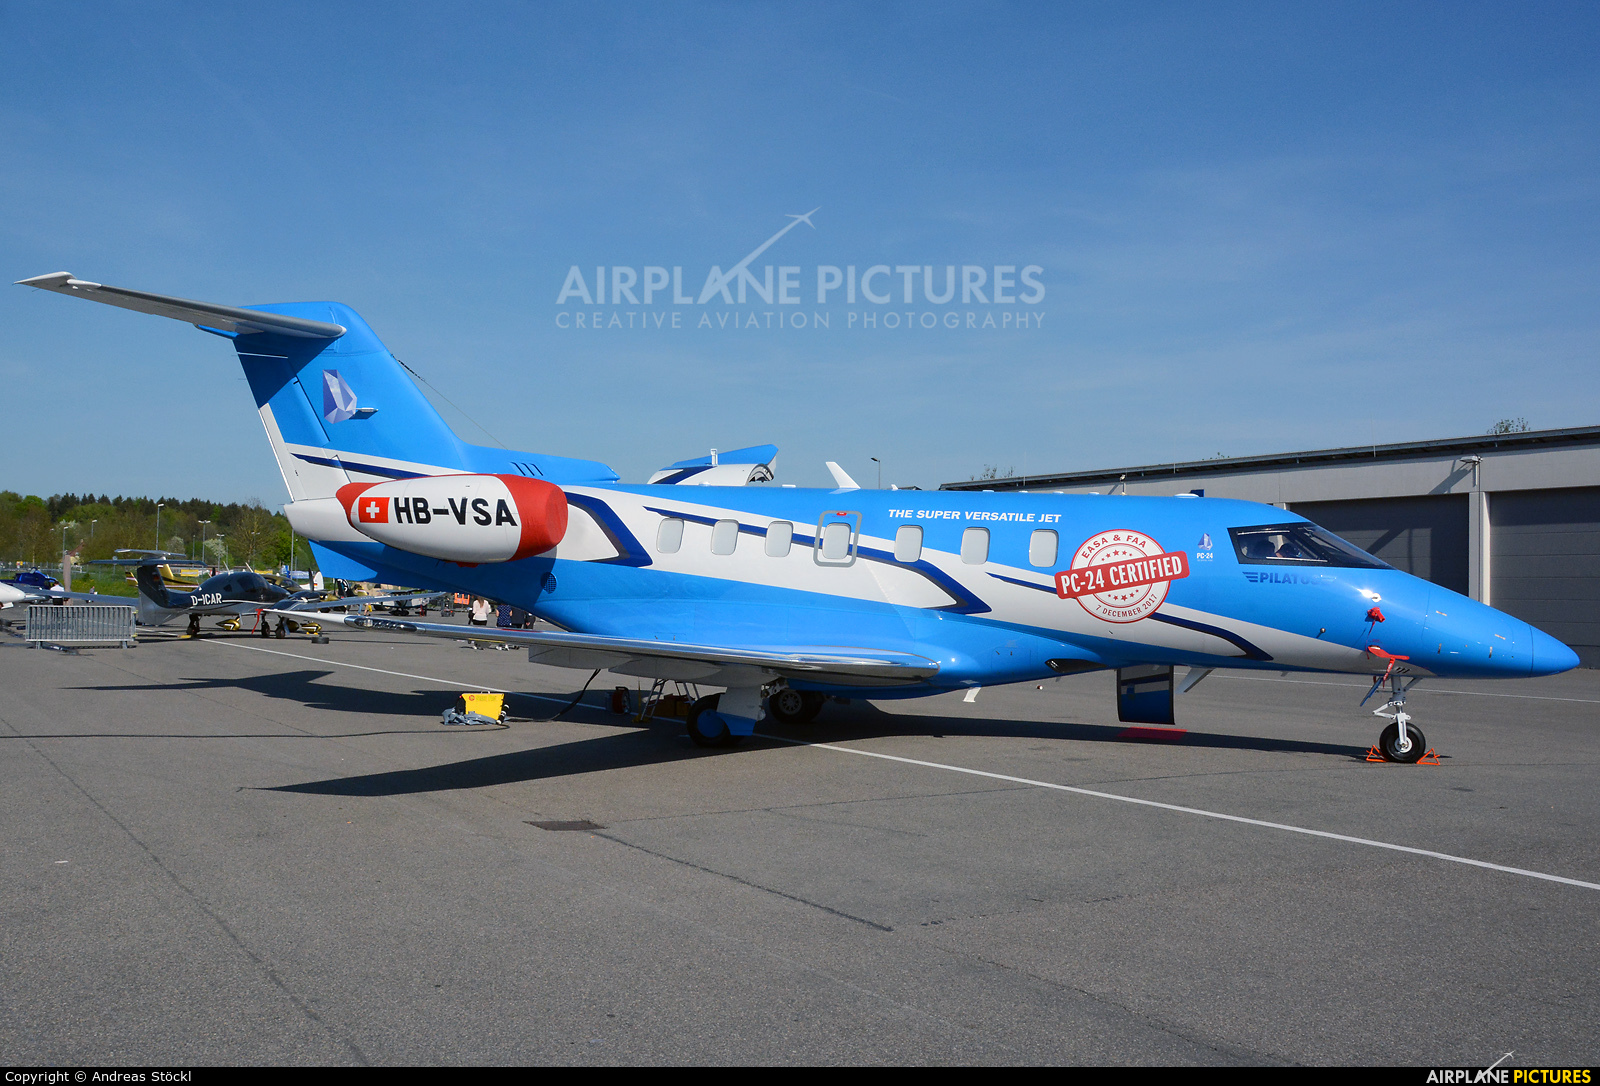 Pilatus HB-VSA aircraft at Friedrichshafen